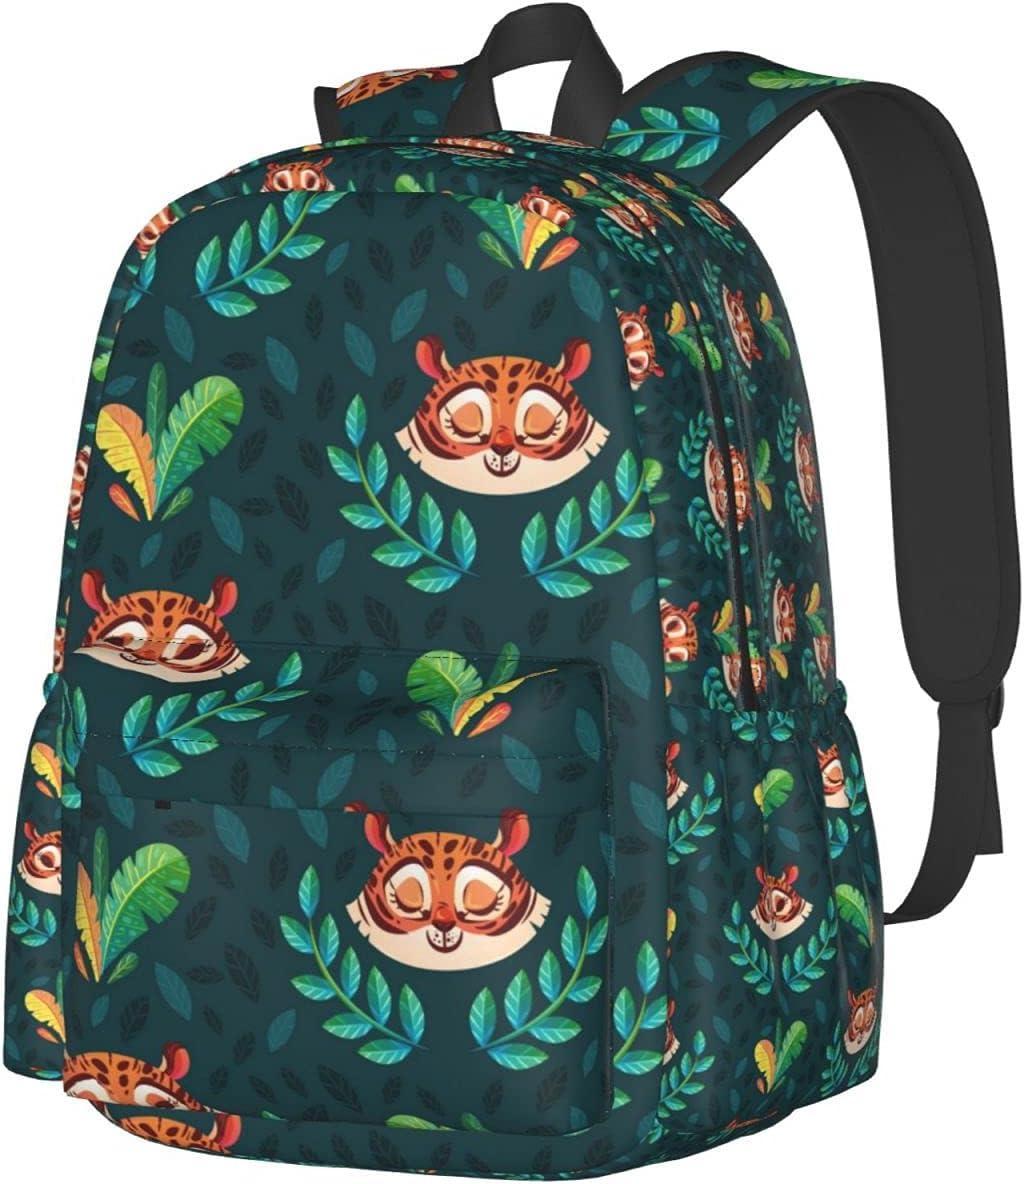 Boys OFFicial Cute Inexpensive Tiger Pattern School Bookbag Elegant Adjustab Shoulder